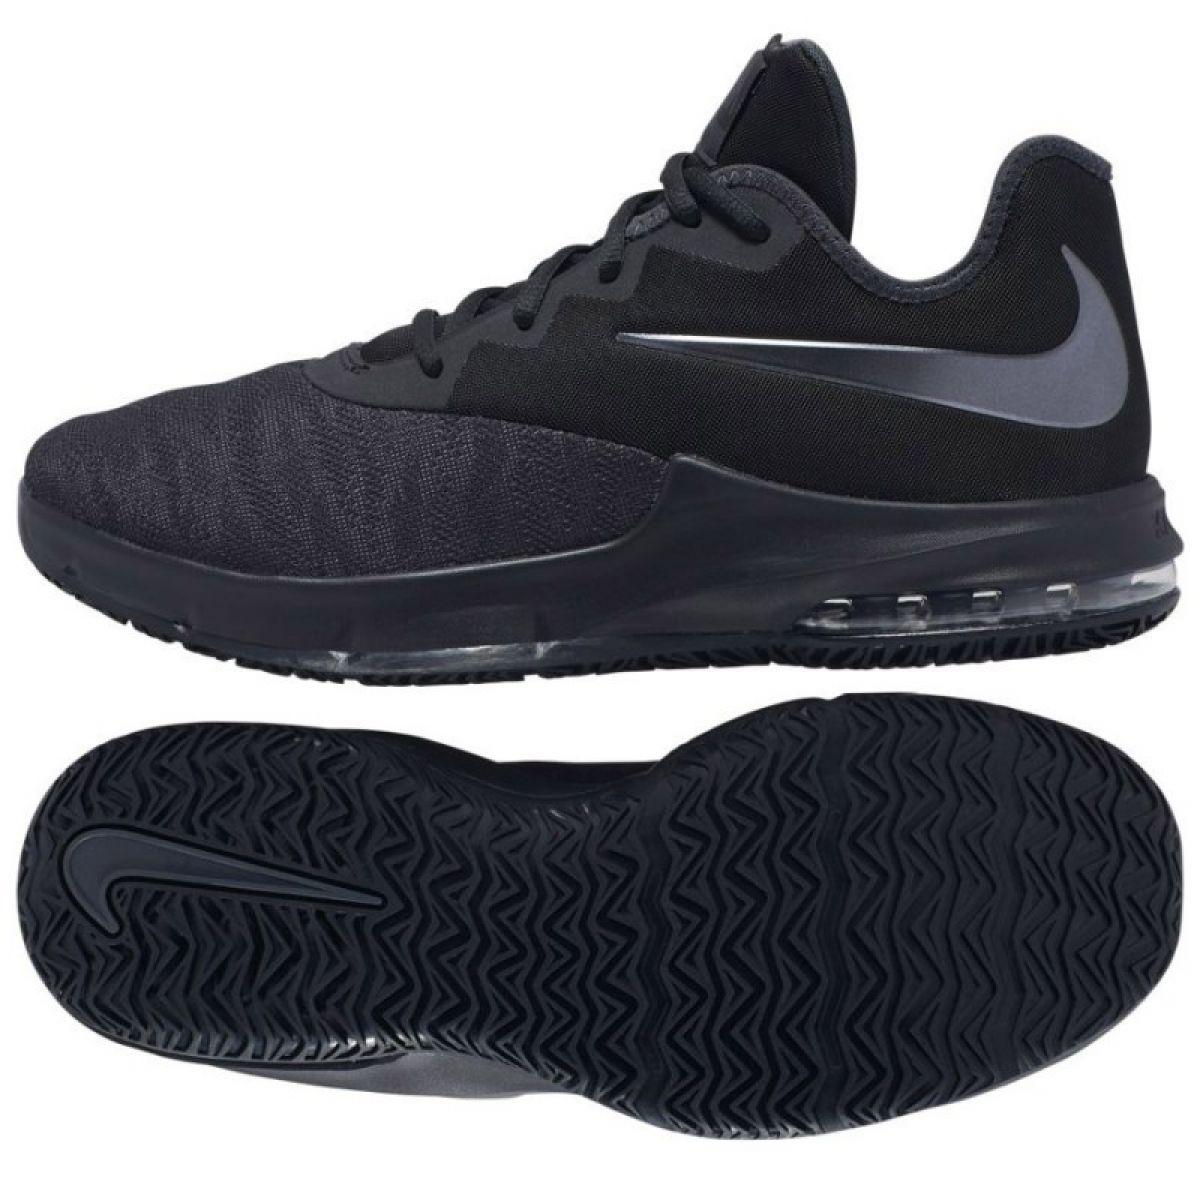 Tênis Nike Masculino Basquete Air Max Infuriate Low Com o